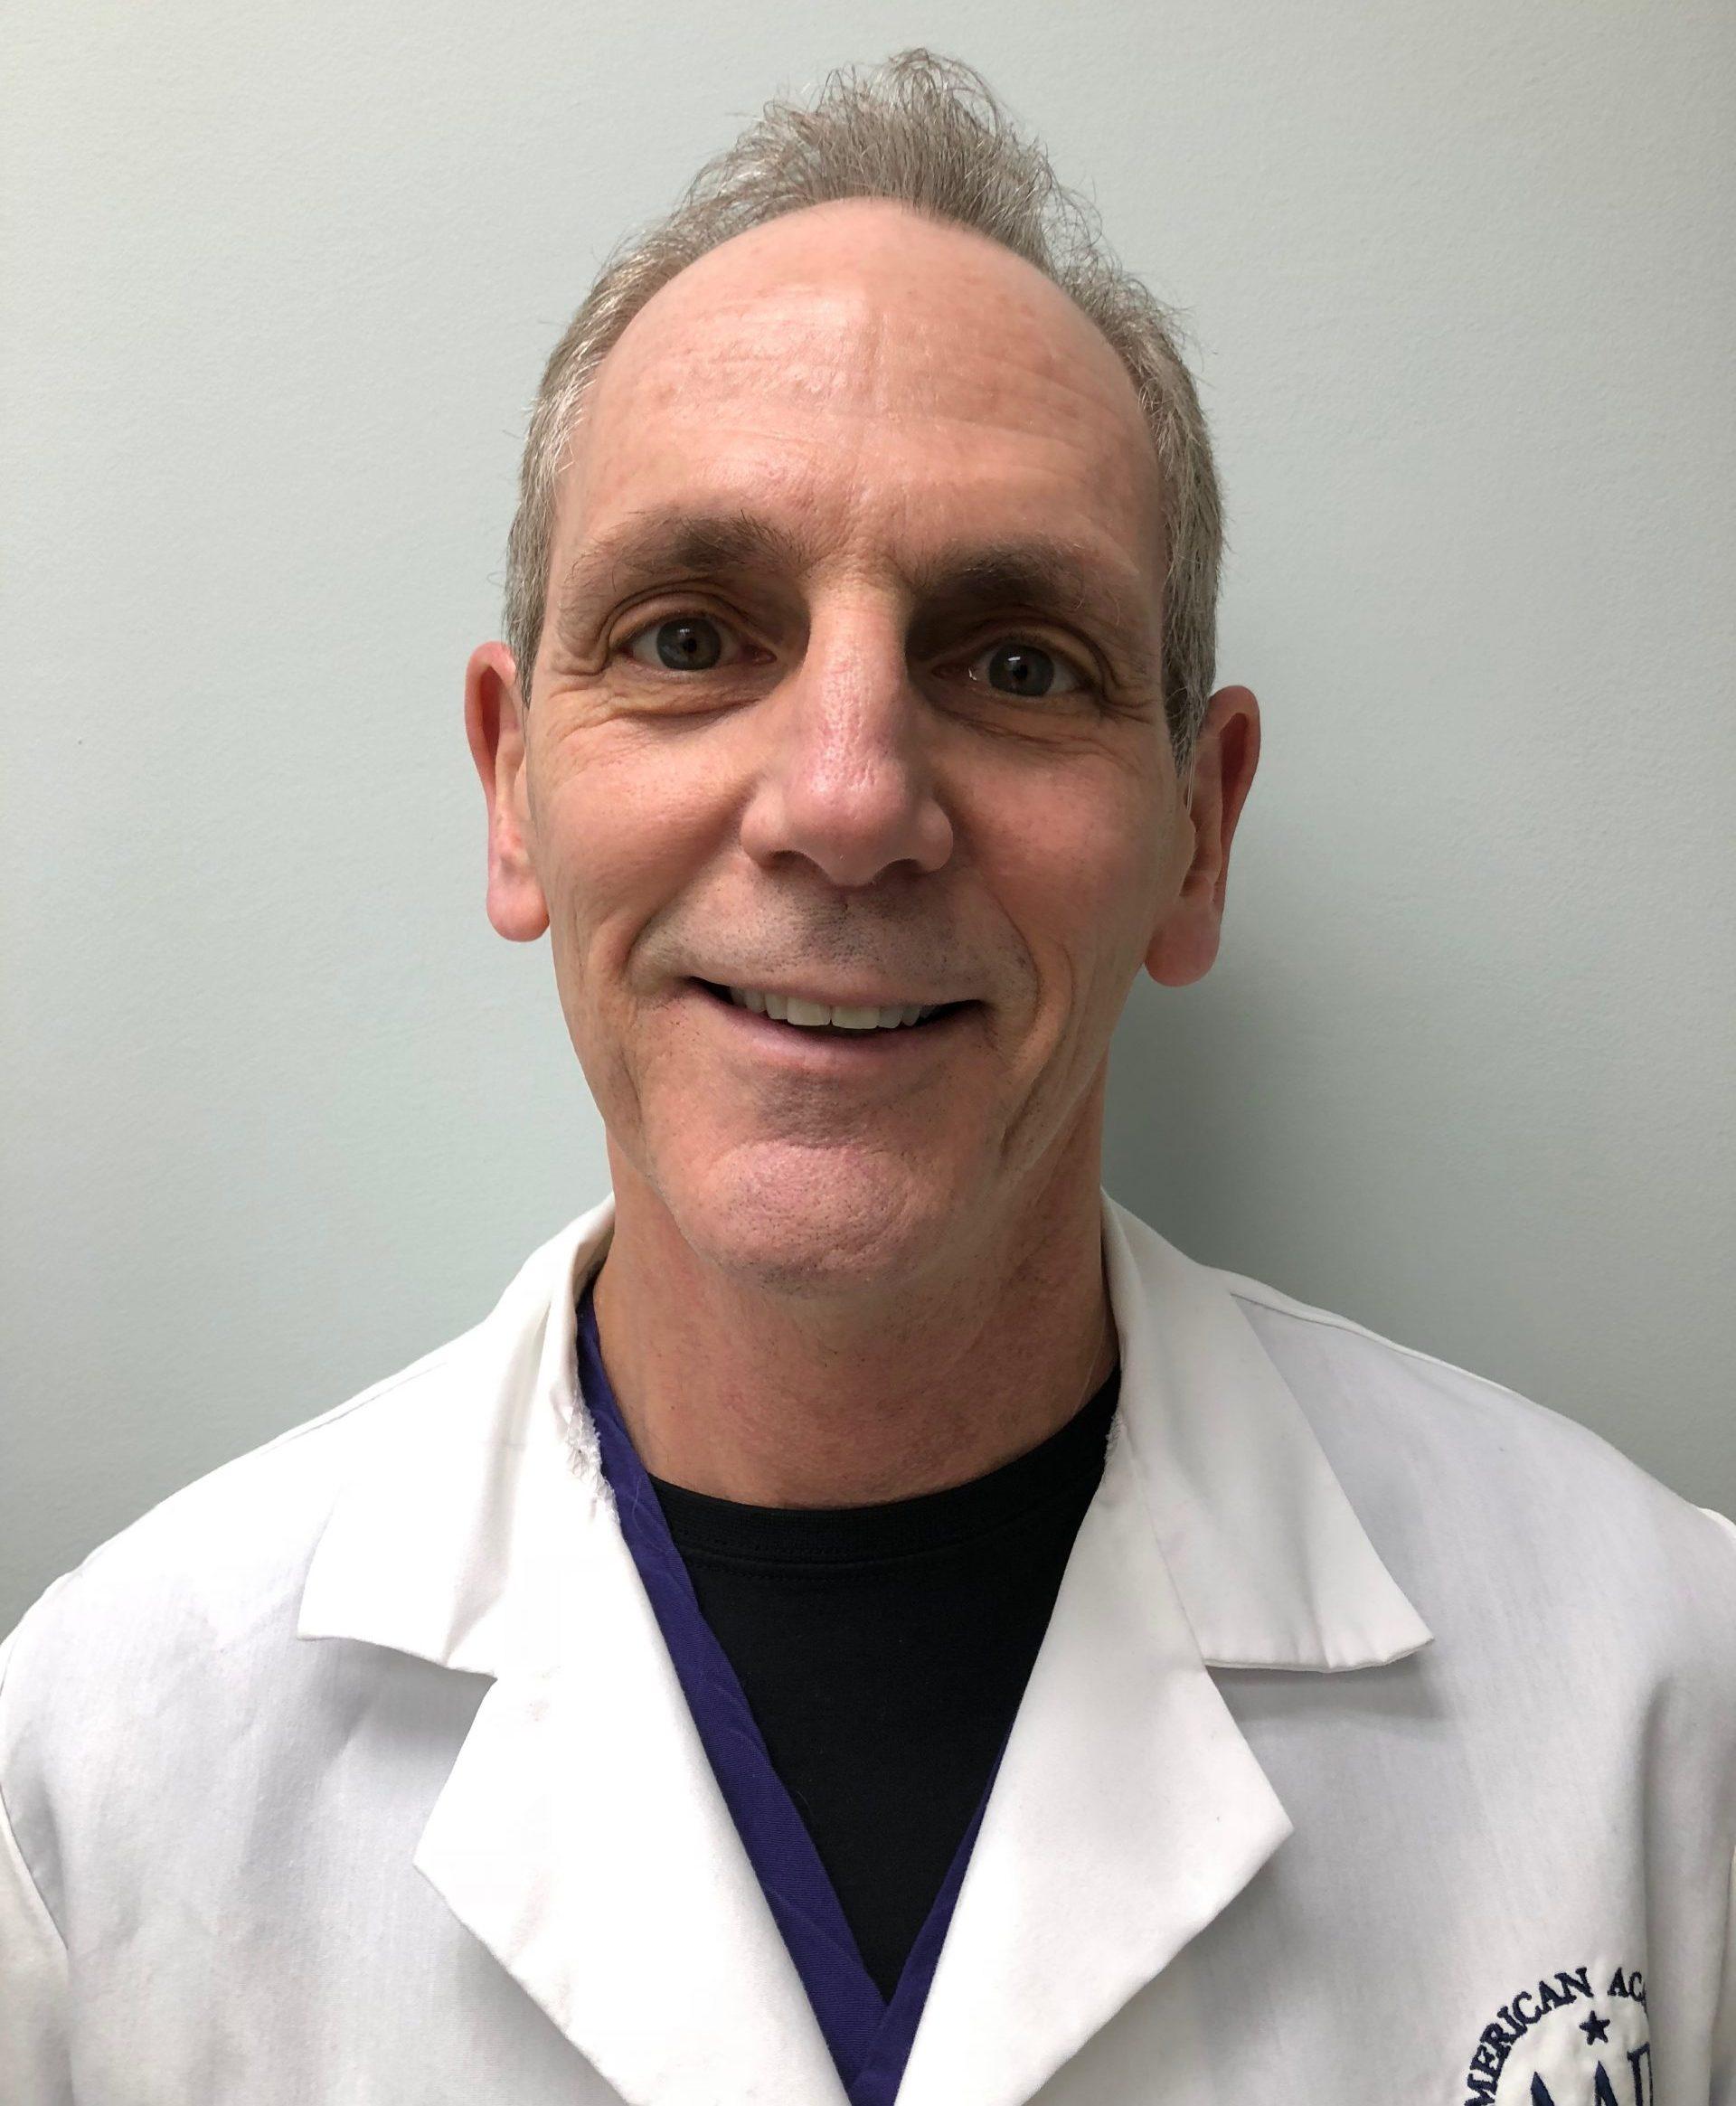 Richard G. Fried, MD, PhD